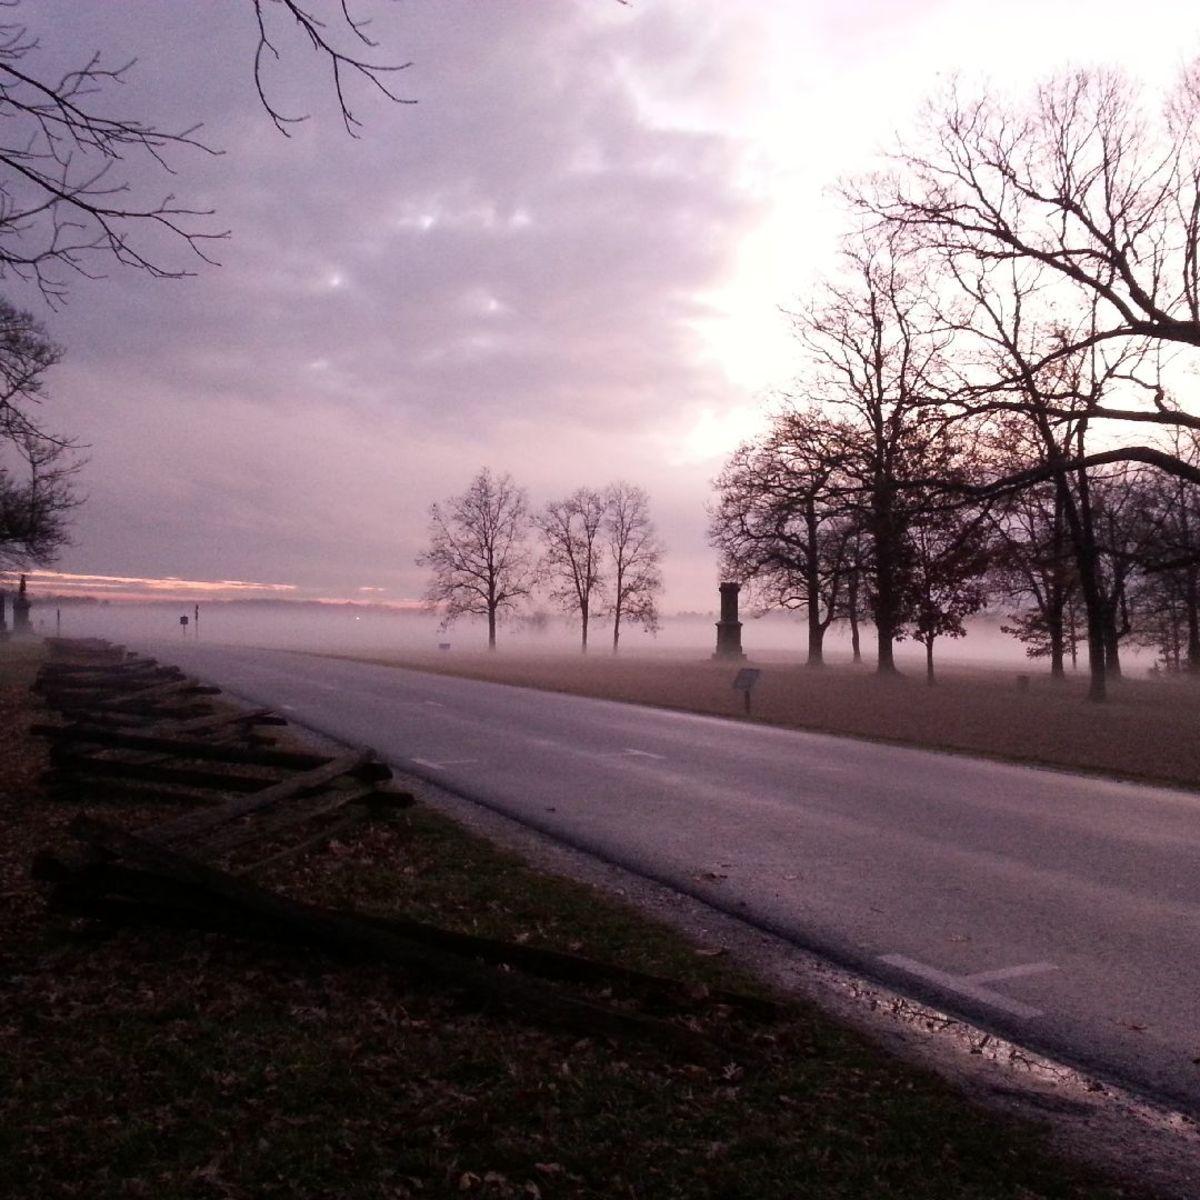 November in Gettysburg